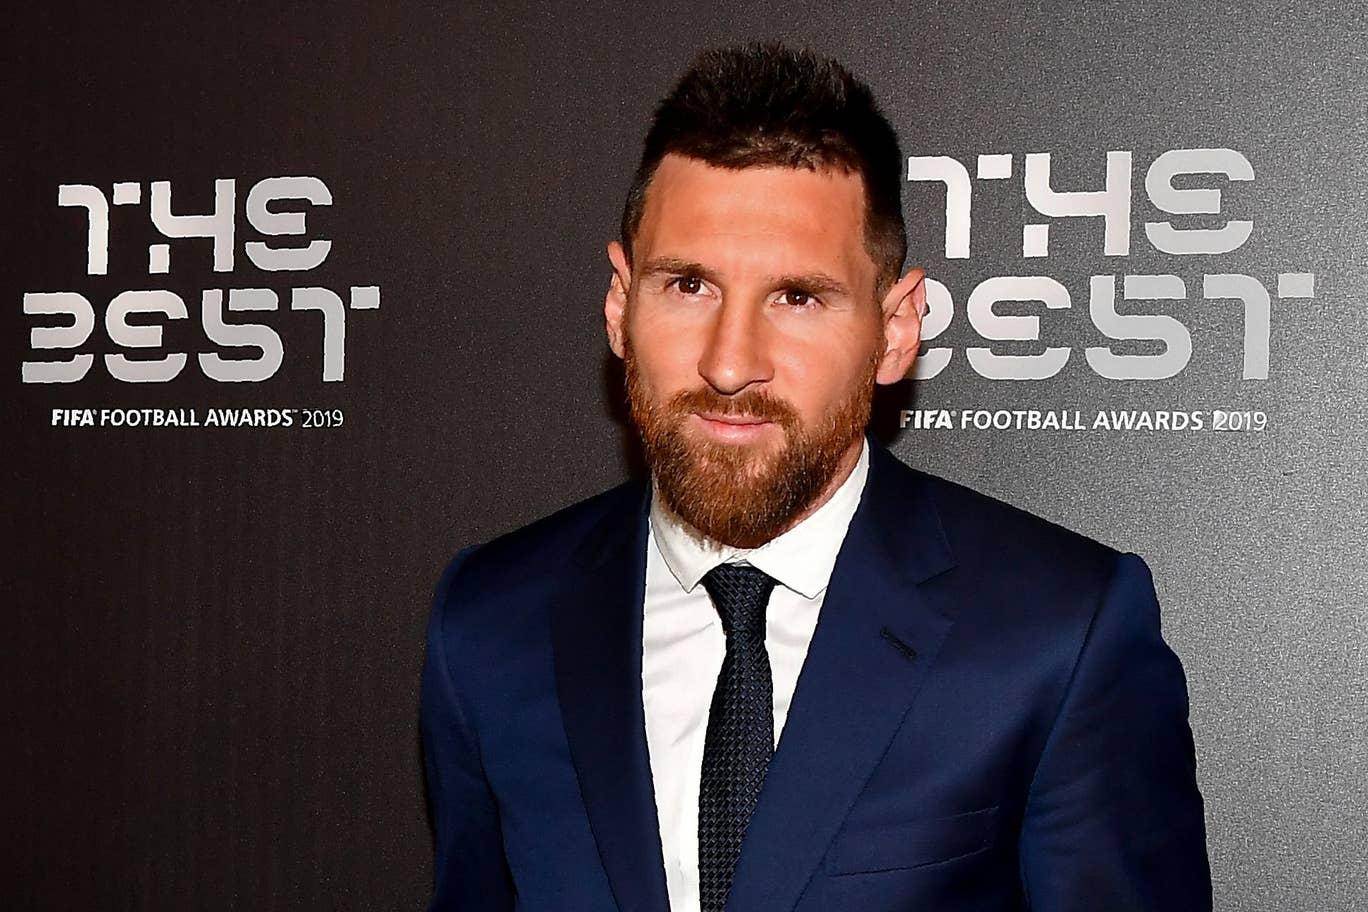 Lionel Messi beats Ronaldo and Van Dijk to win 6th FIFA Best player award